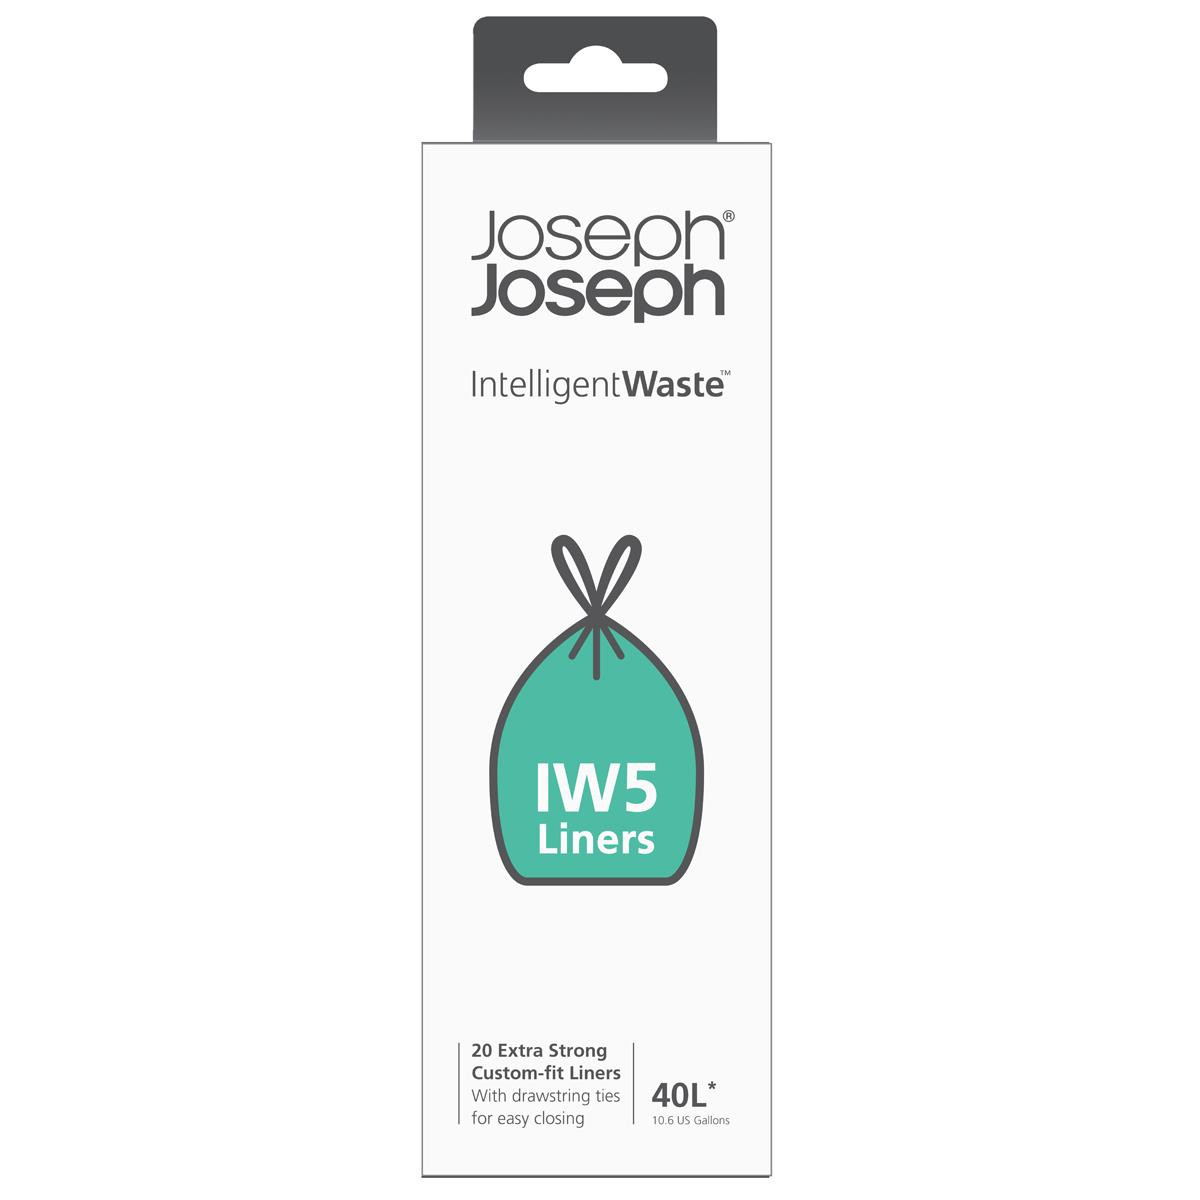 Joseph Joseph IW5 20L General Waste Liners